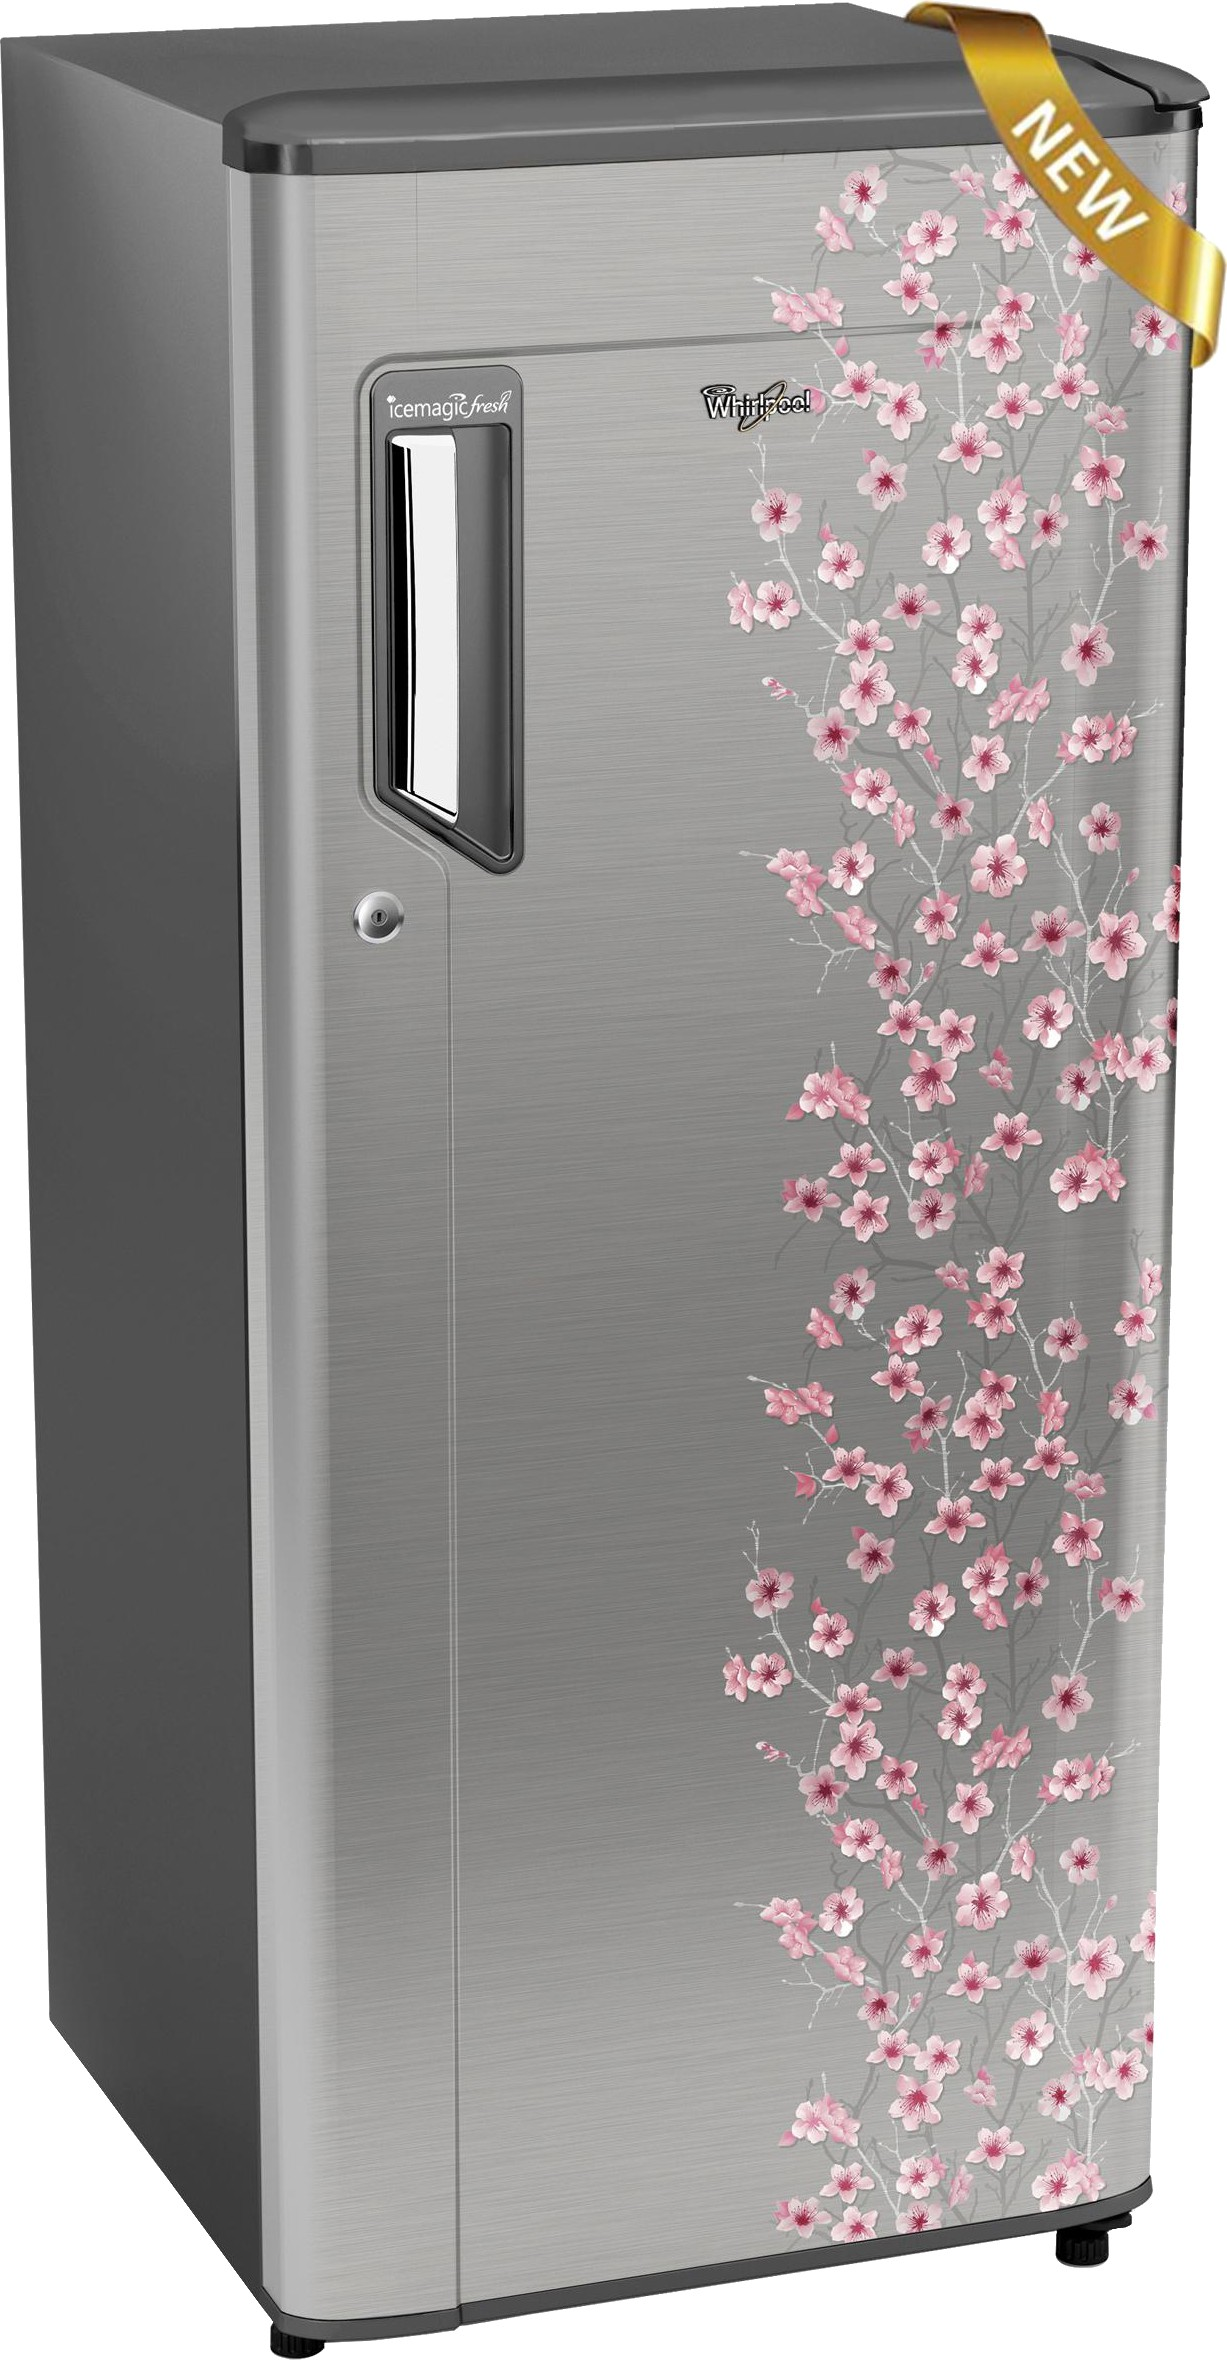 Whirlpool 260 IMFRESH PRM 4S 245 L Single Door Refrigerator   Refrigerator  (Whirlpool)